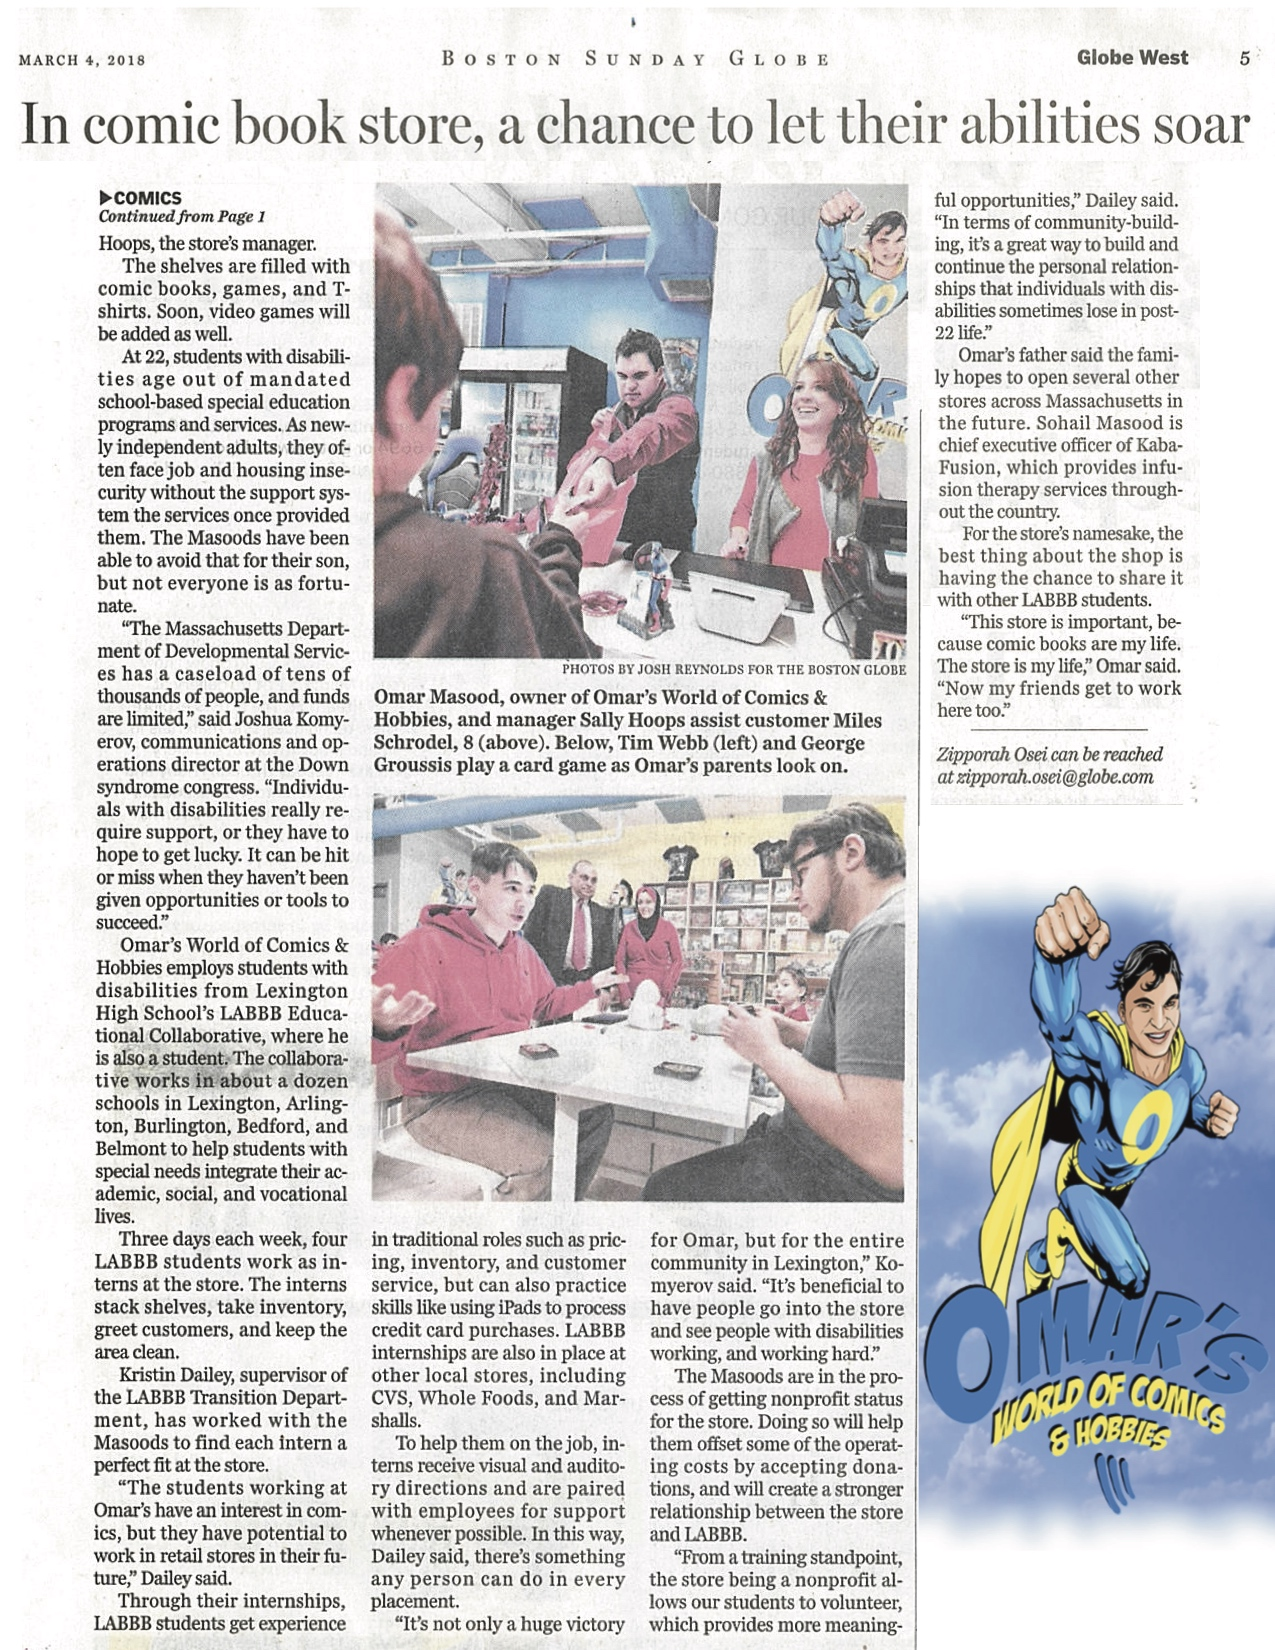 Omar Boston Globe Article 2.jpg